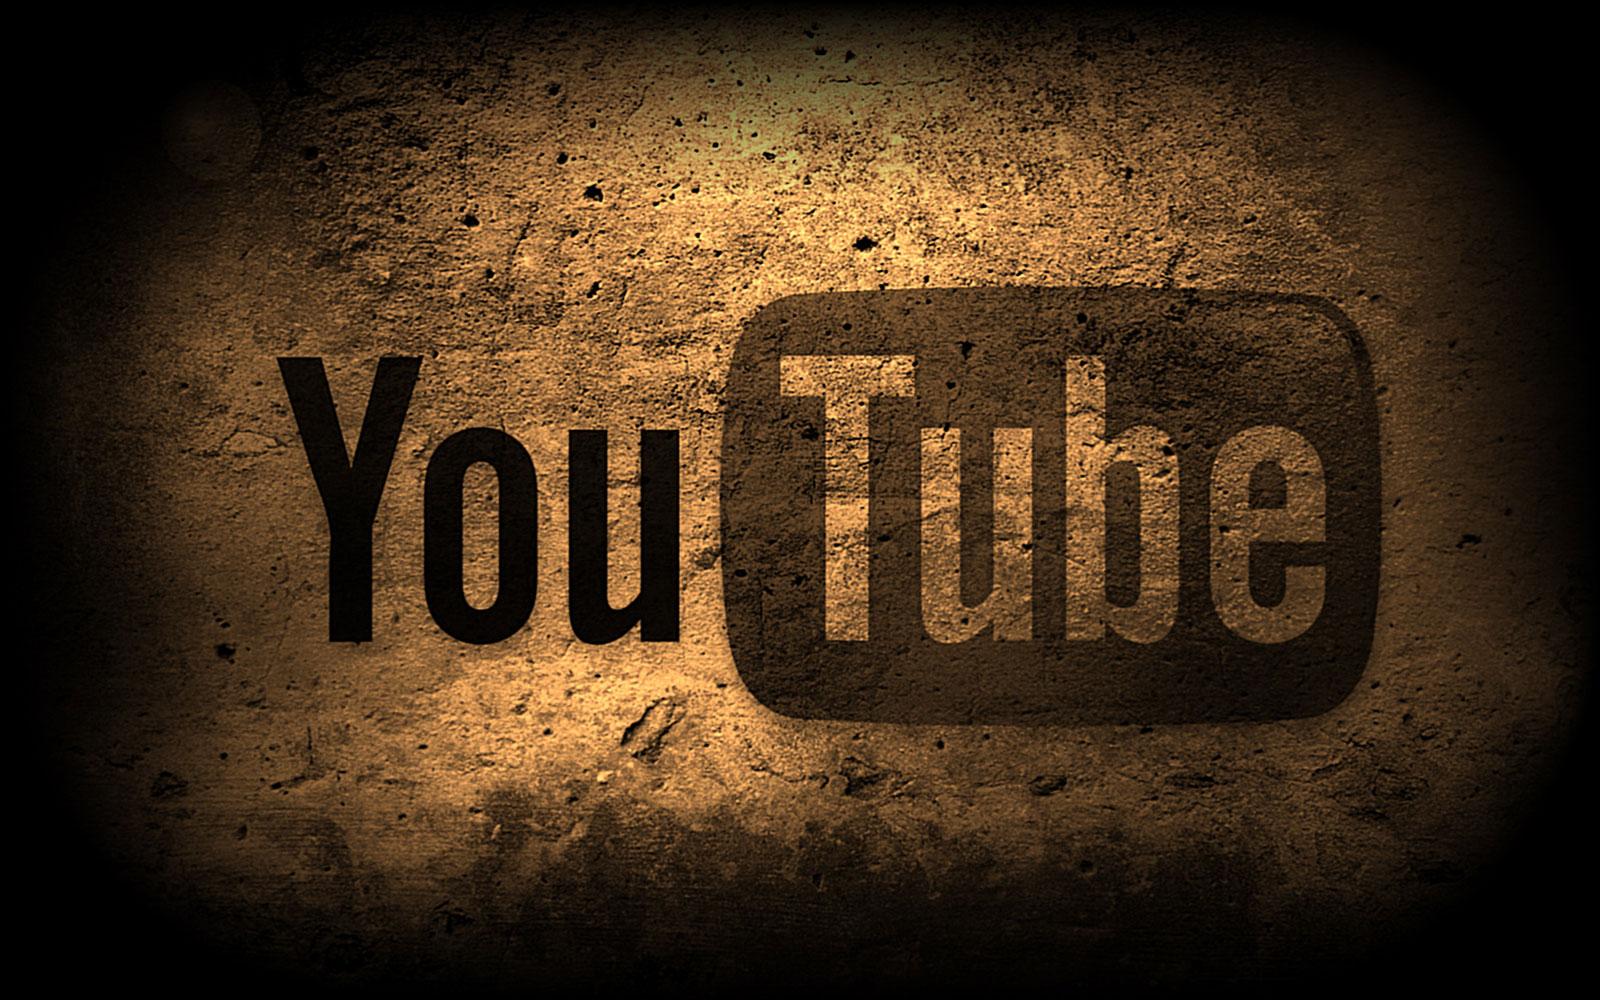 http://2.bp.blogspot.com/-YfN_yeGOdQM/Tj0m6NjGdxI/AAAAAAAARtI/XJ_ca9JikRw/s1600/YouTube-Logo-Widescreen-Wallpaper.jpg